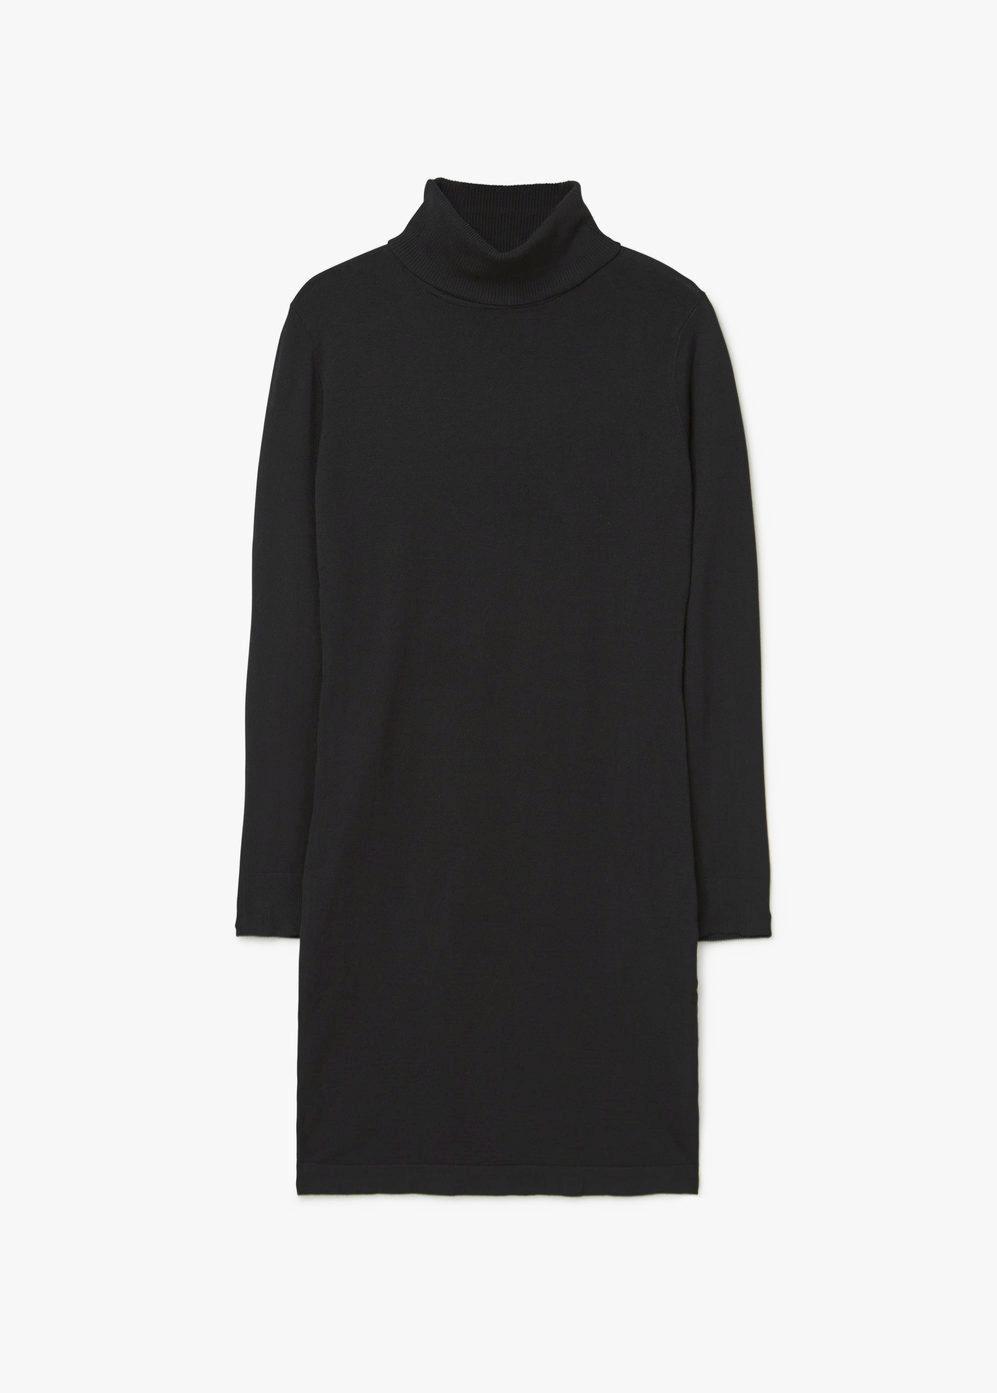 Vestido de cuello alto. De Mango, 25,99 euros.